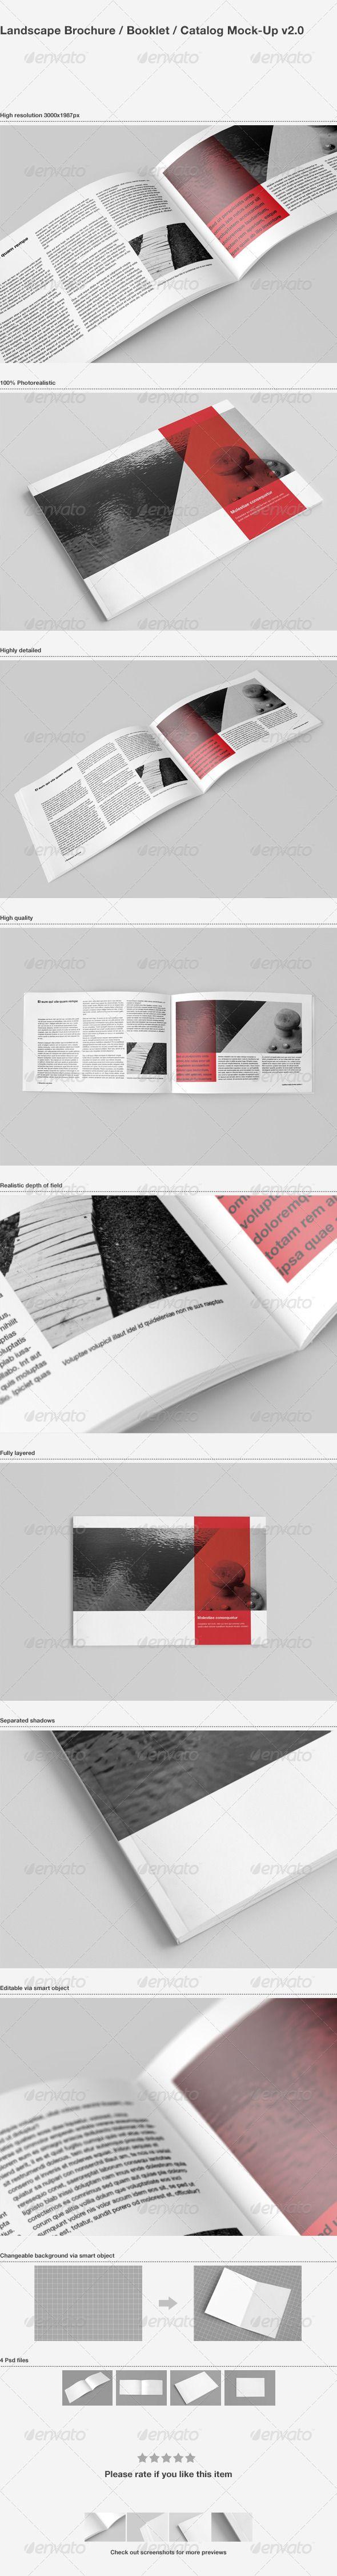 Brochure / Catalog Mock-Up   Brochures, Mockup and Brochure template